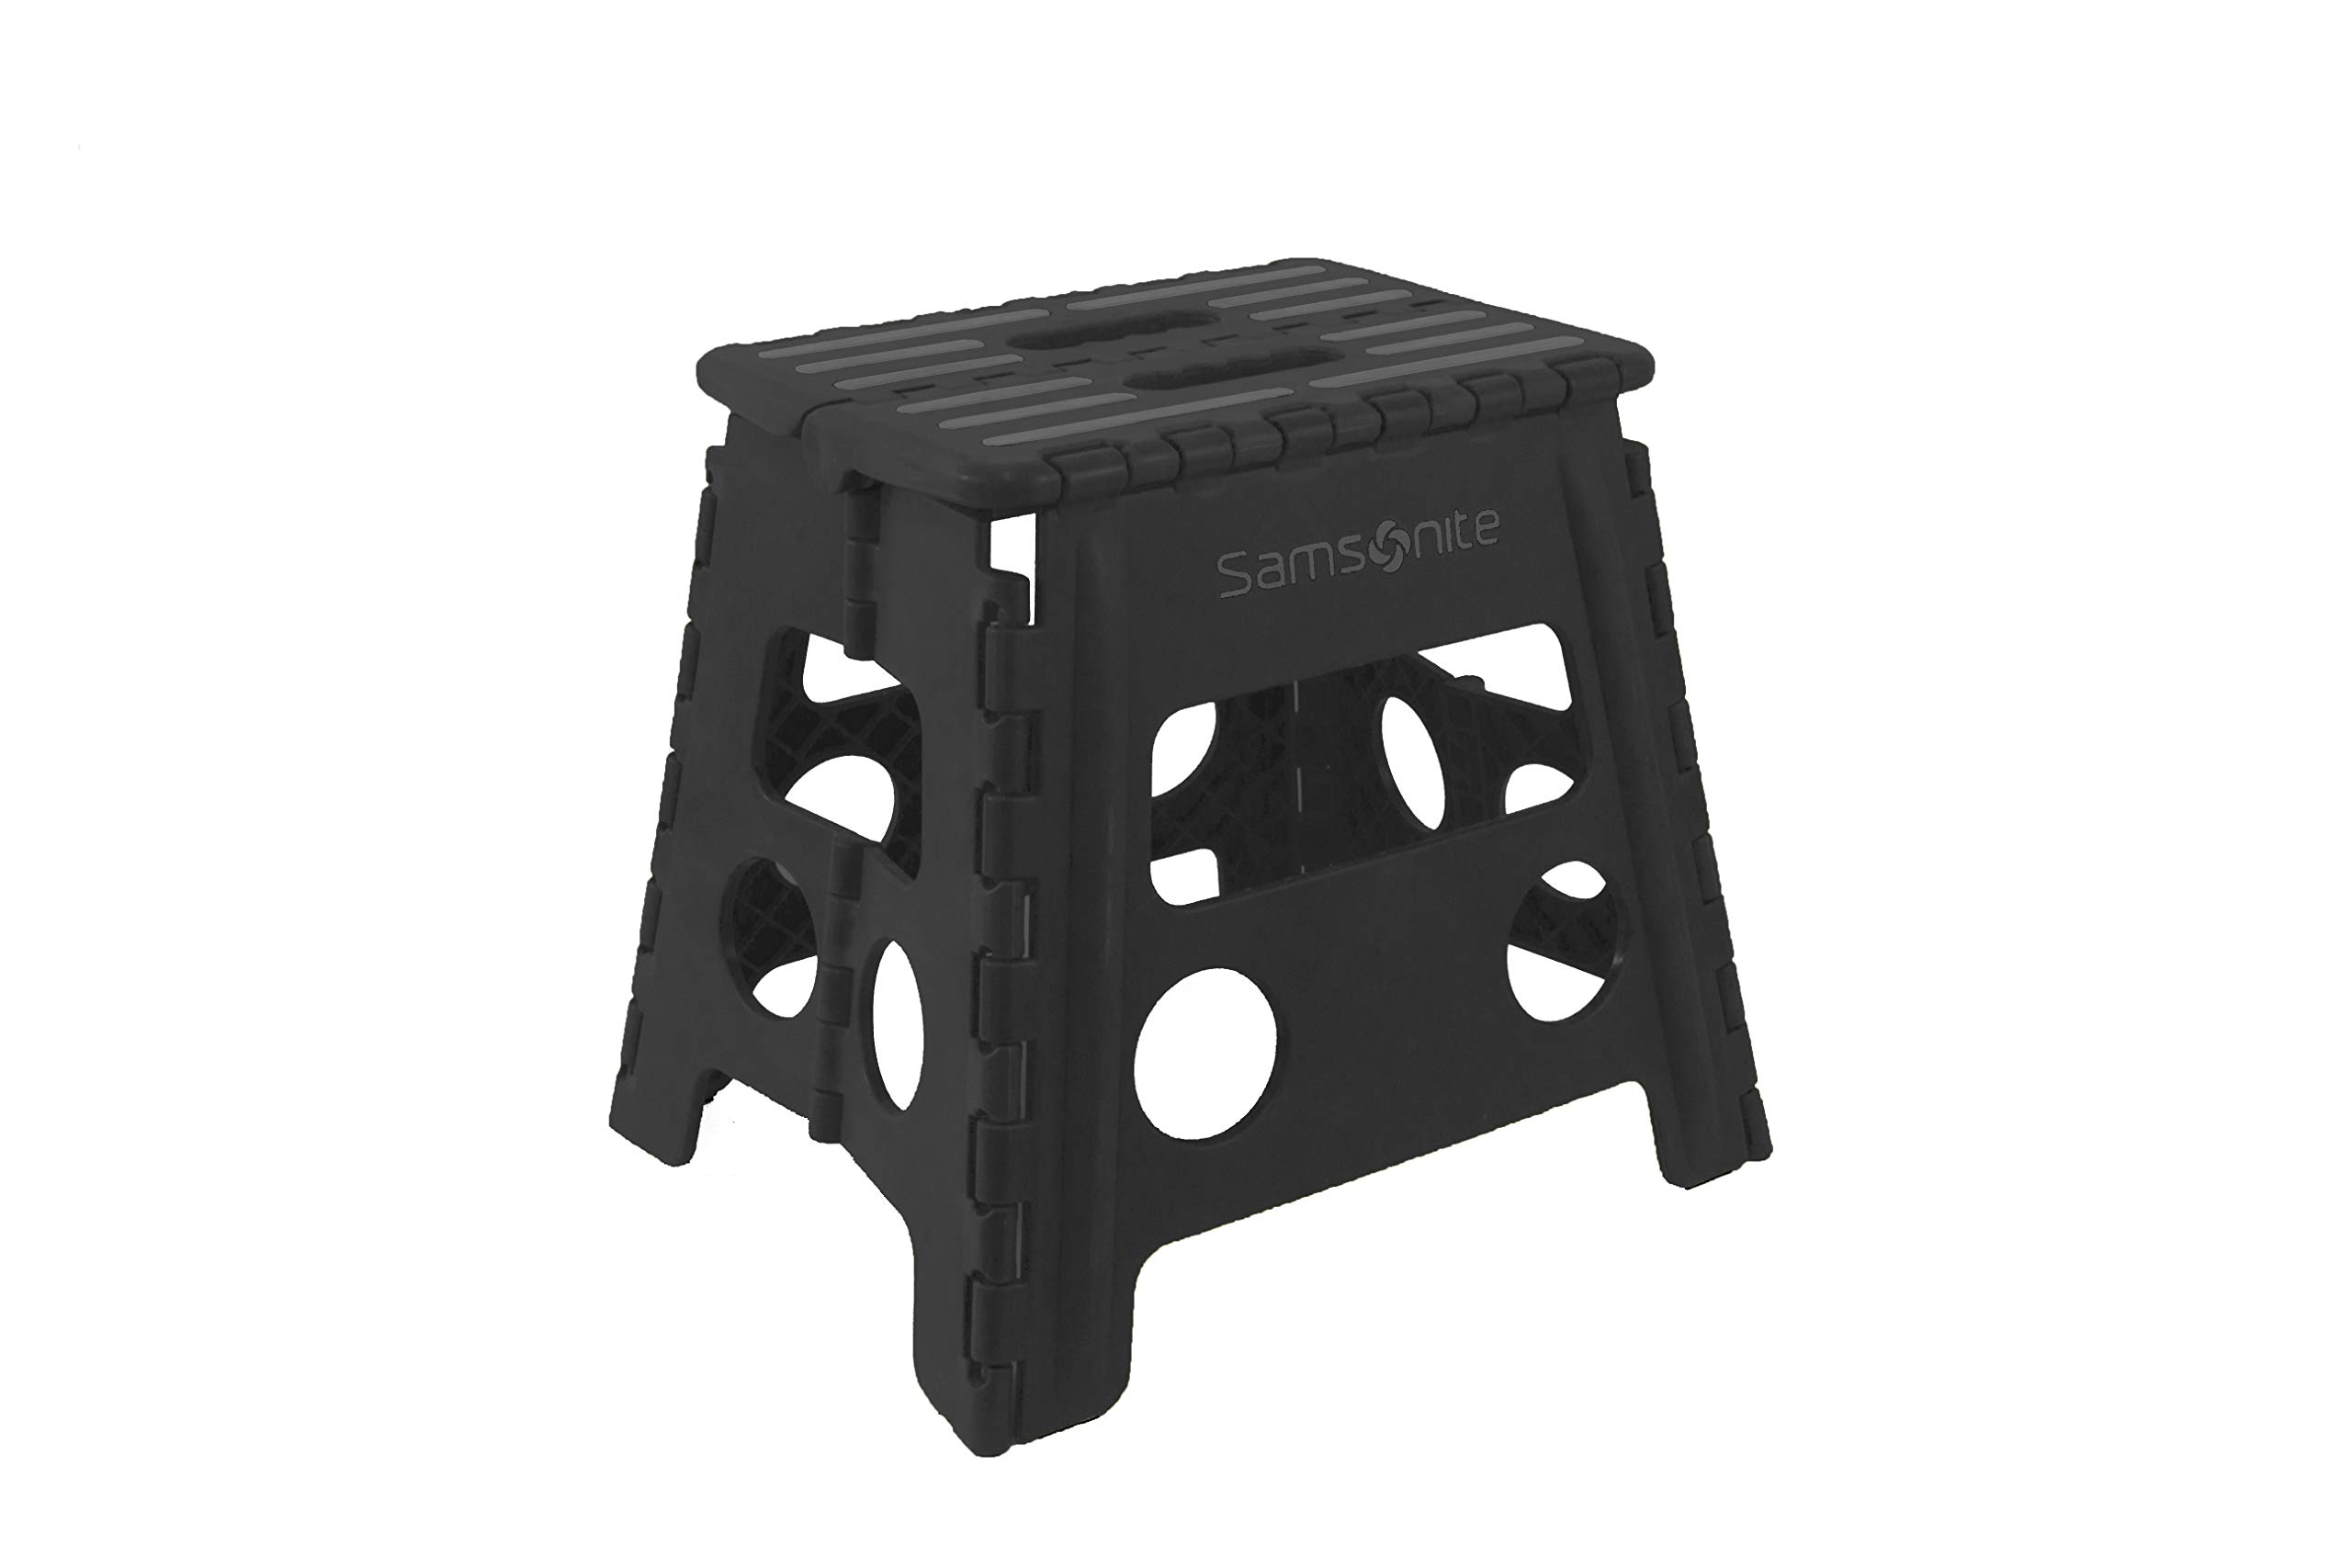 Samsonite Heavy Duty Folding Step Stool in Black - (13'' High Single Handle) by Vanderbilt Home